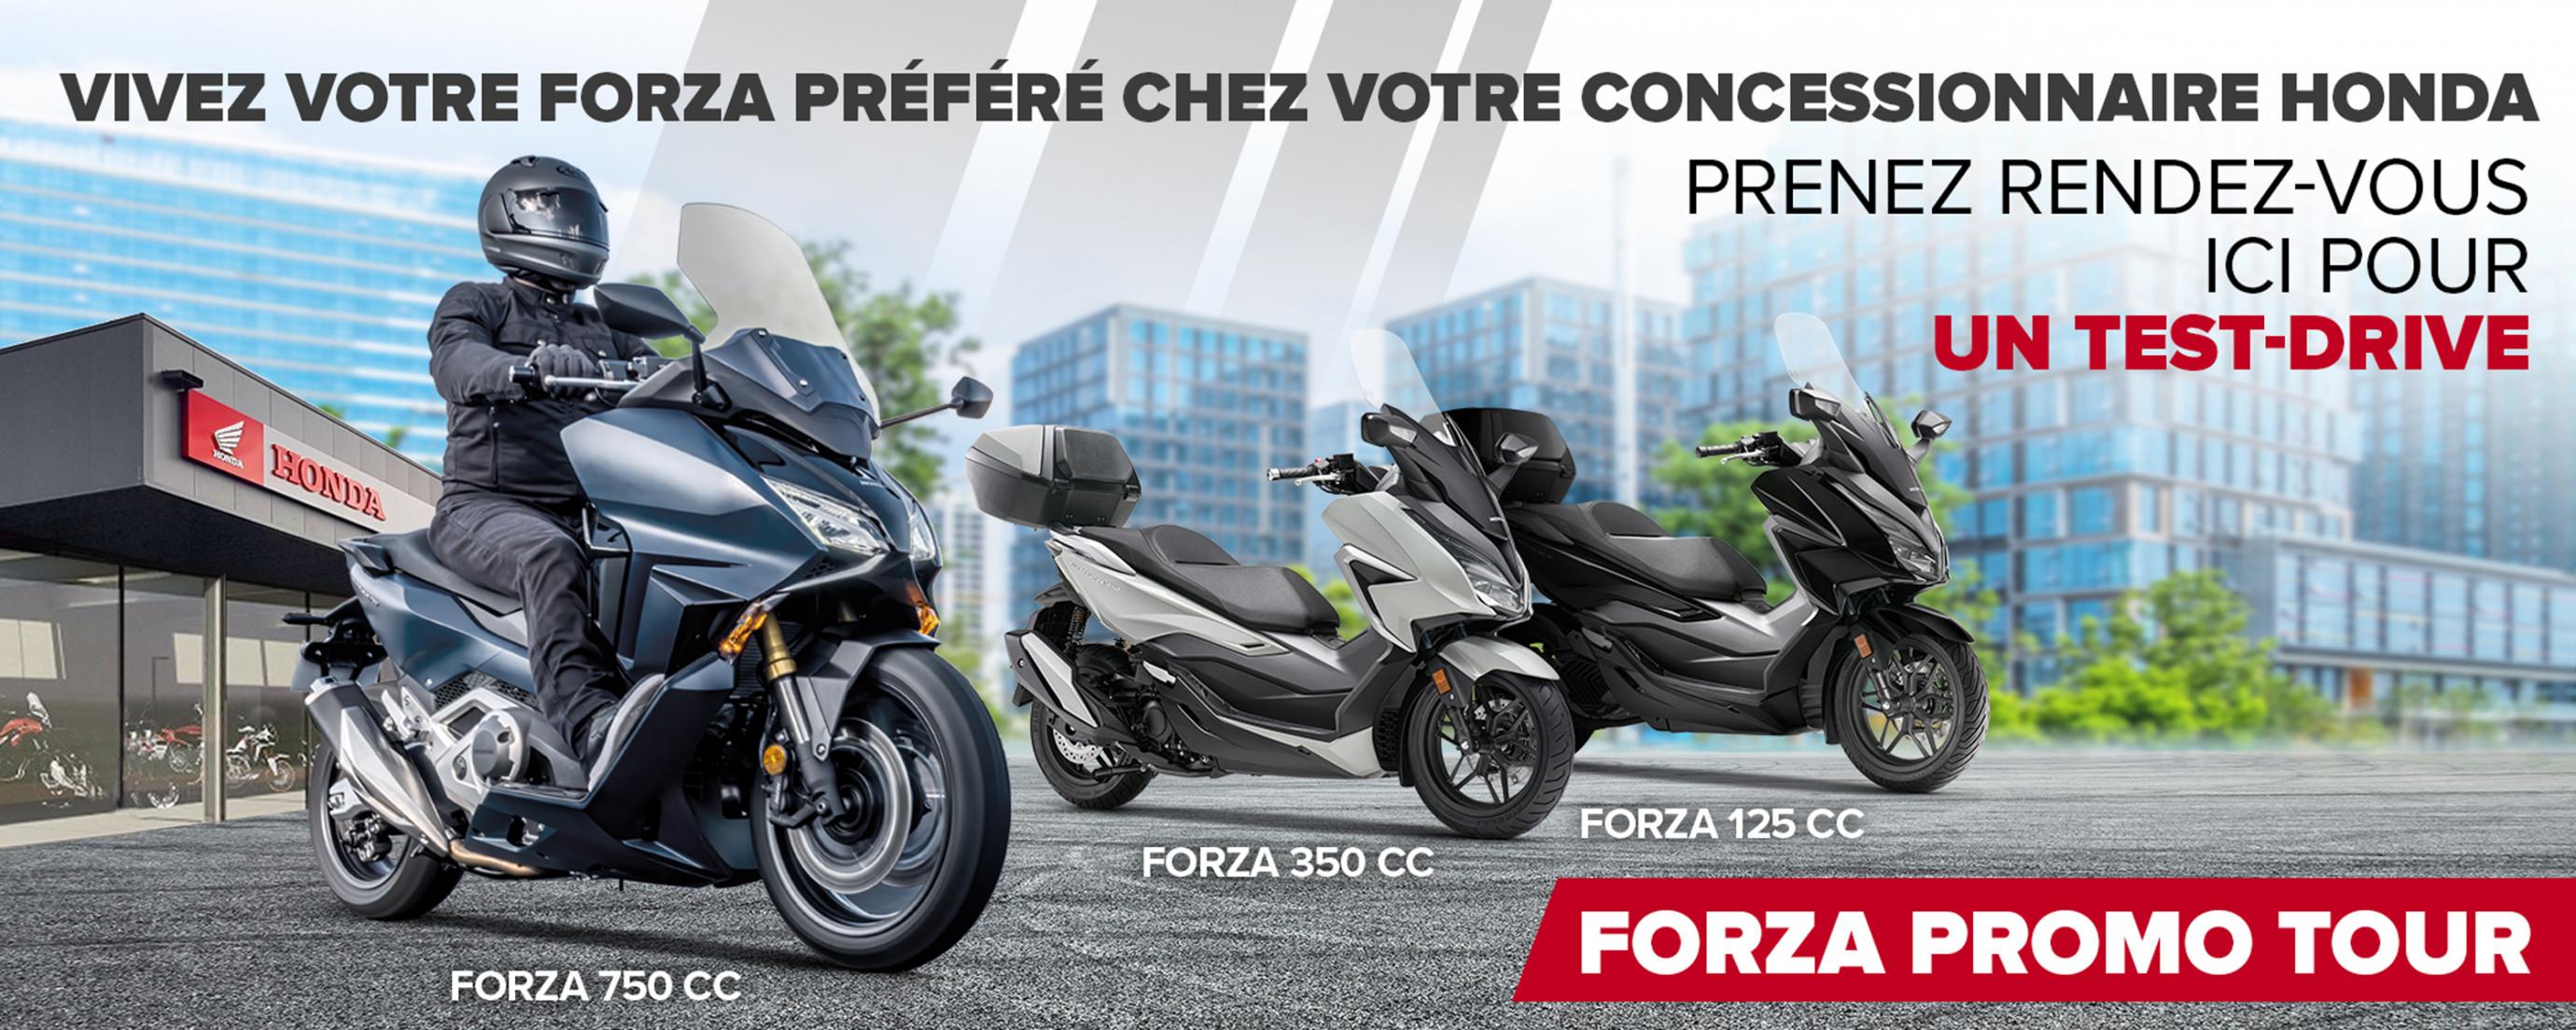 Forza-3000x1200_3FR